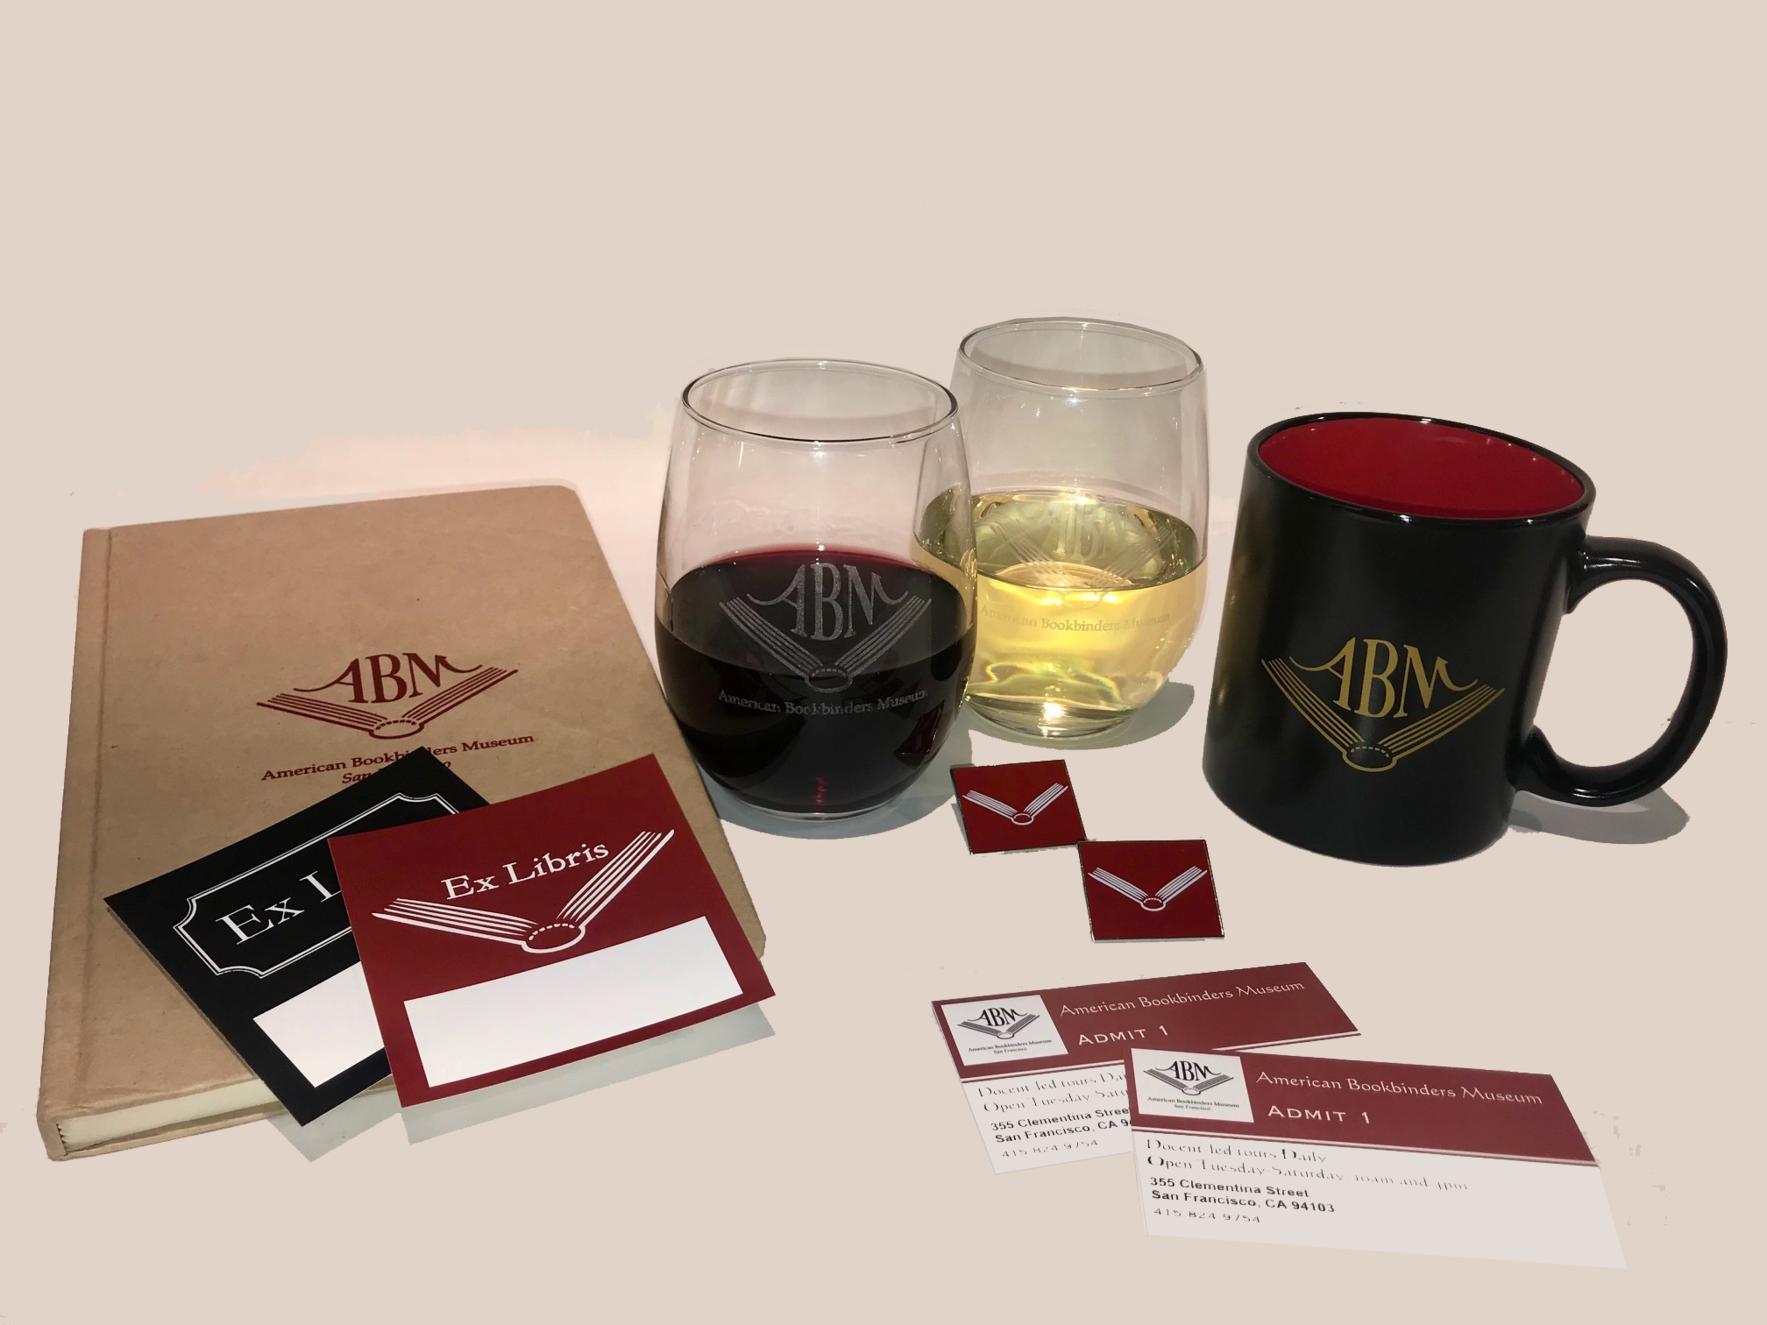 2020 ABM Guild Membership image